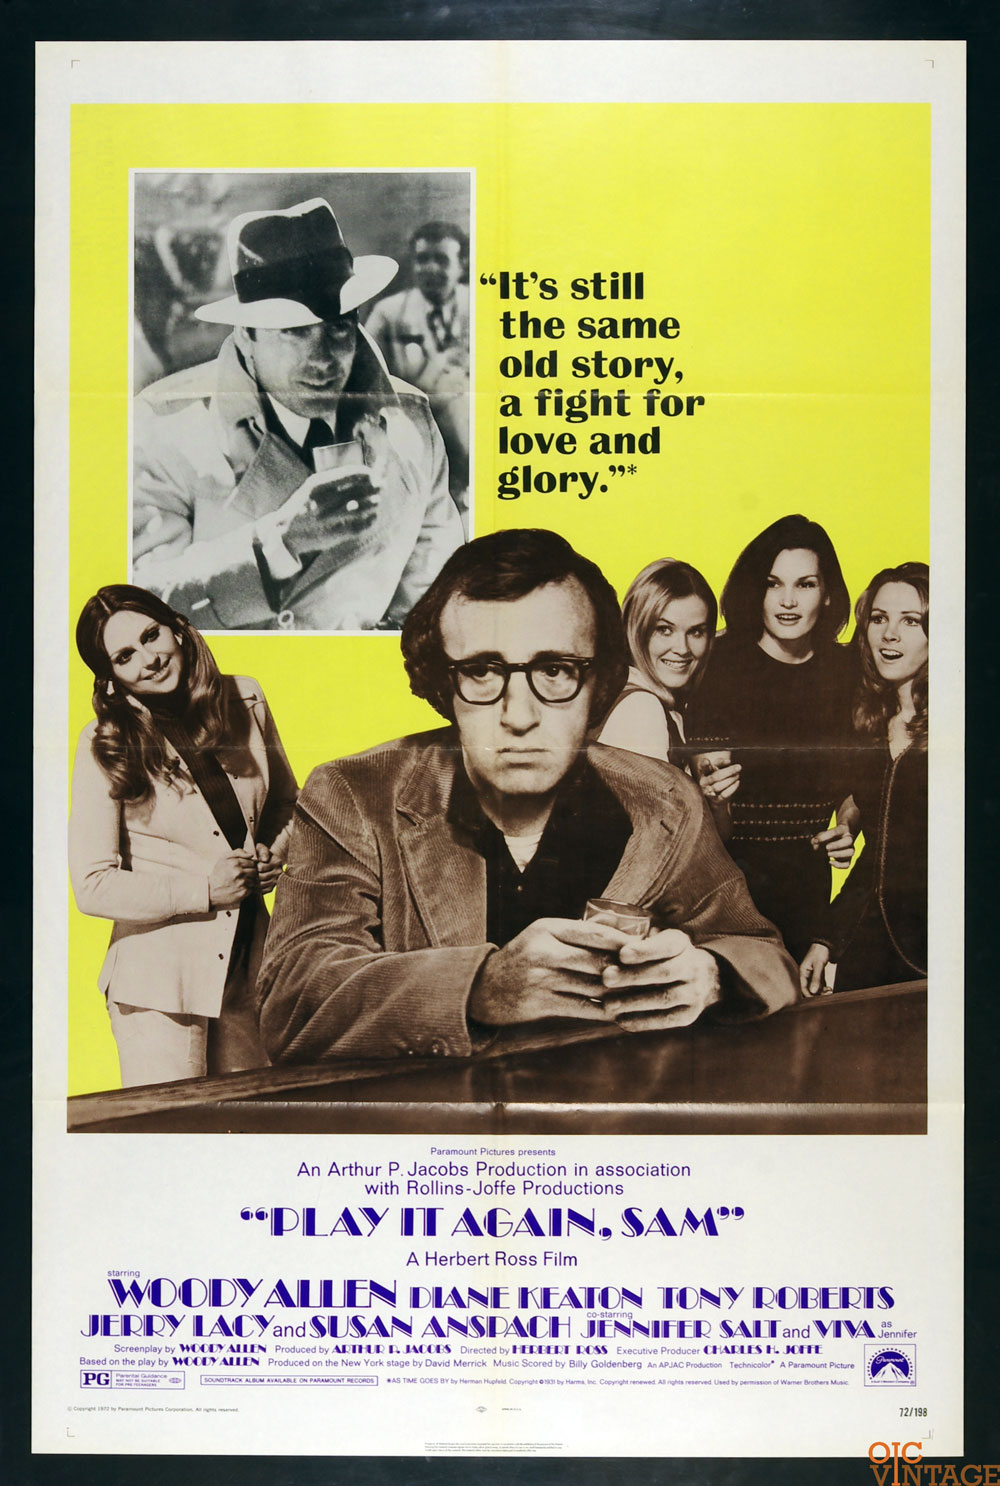 Play it Again Sam Movie Poster 1972 Woody Allen 27 x 41 1 Sheet